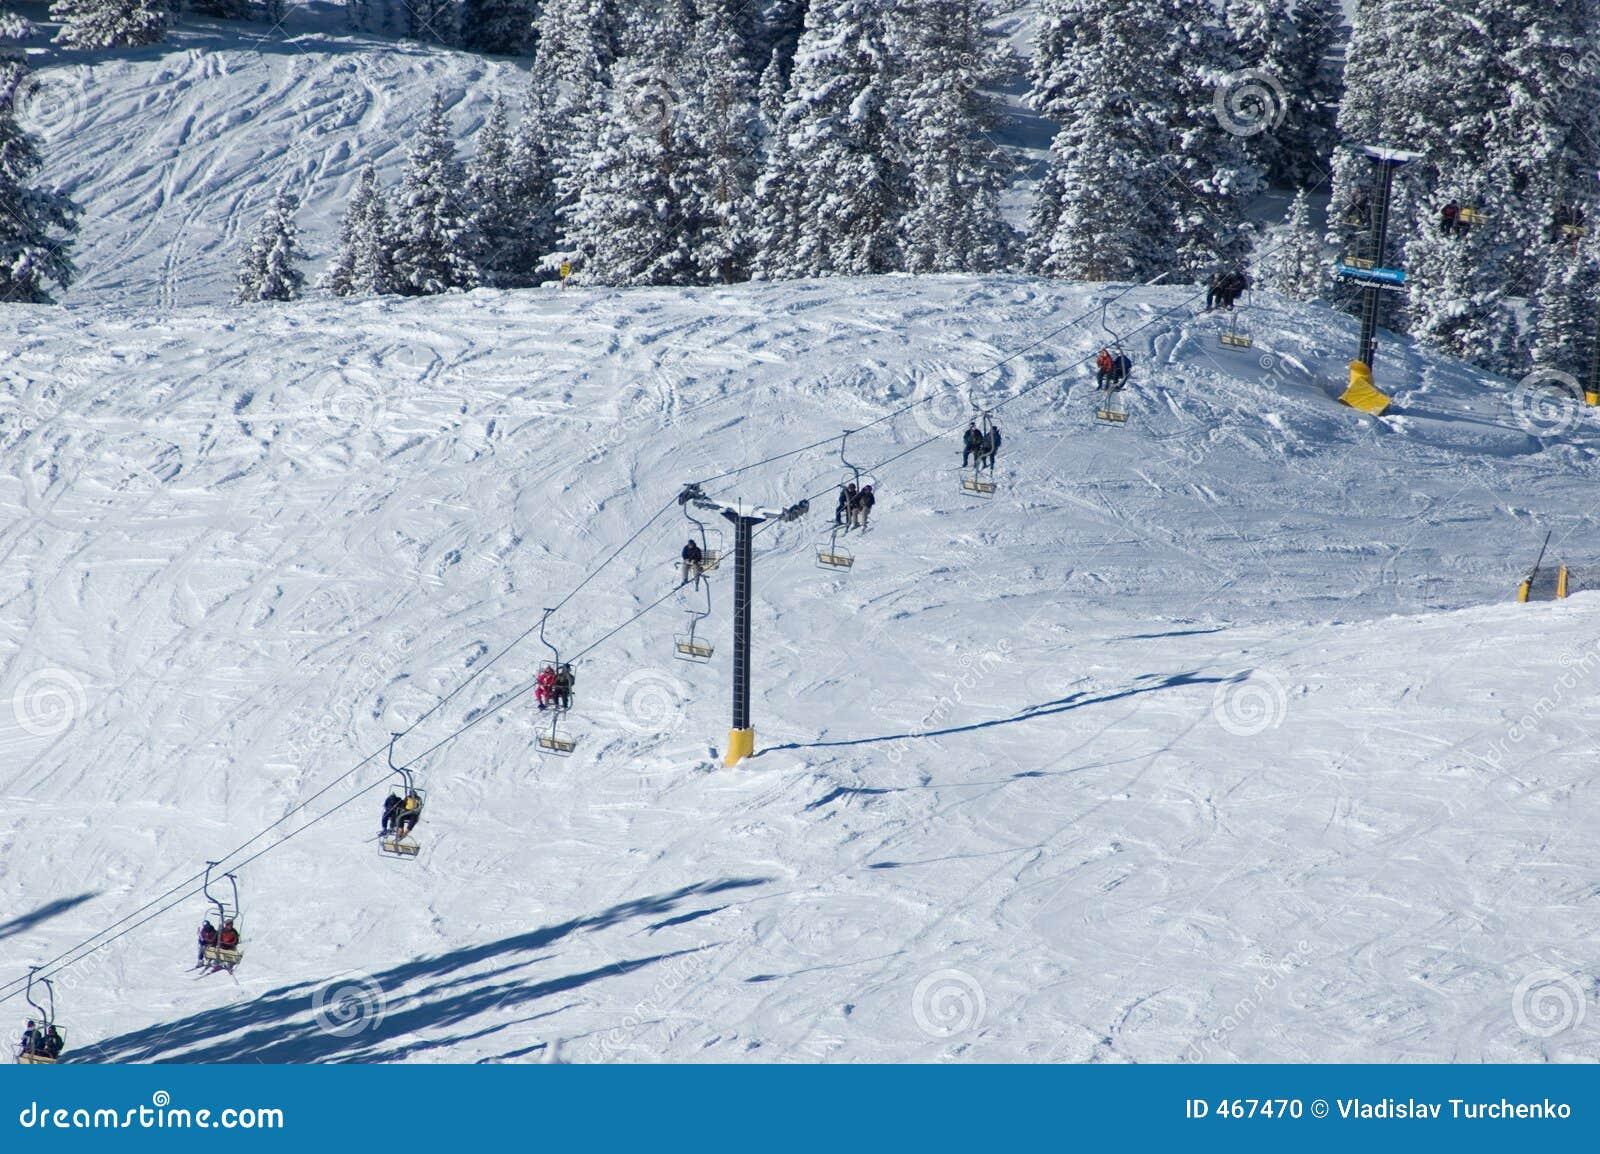 Ski lift at the resort